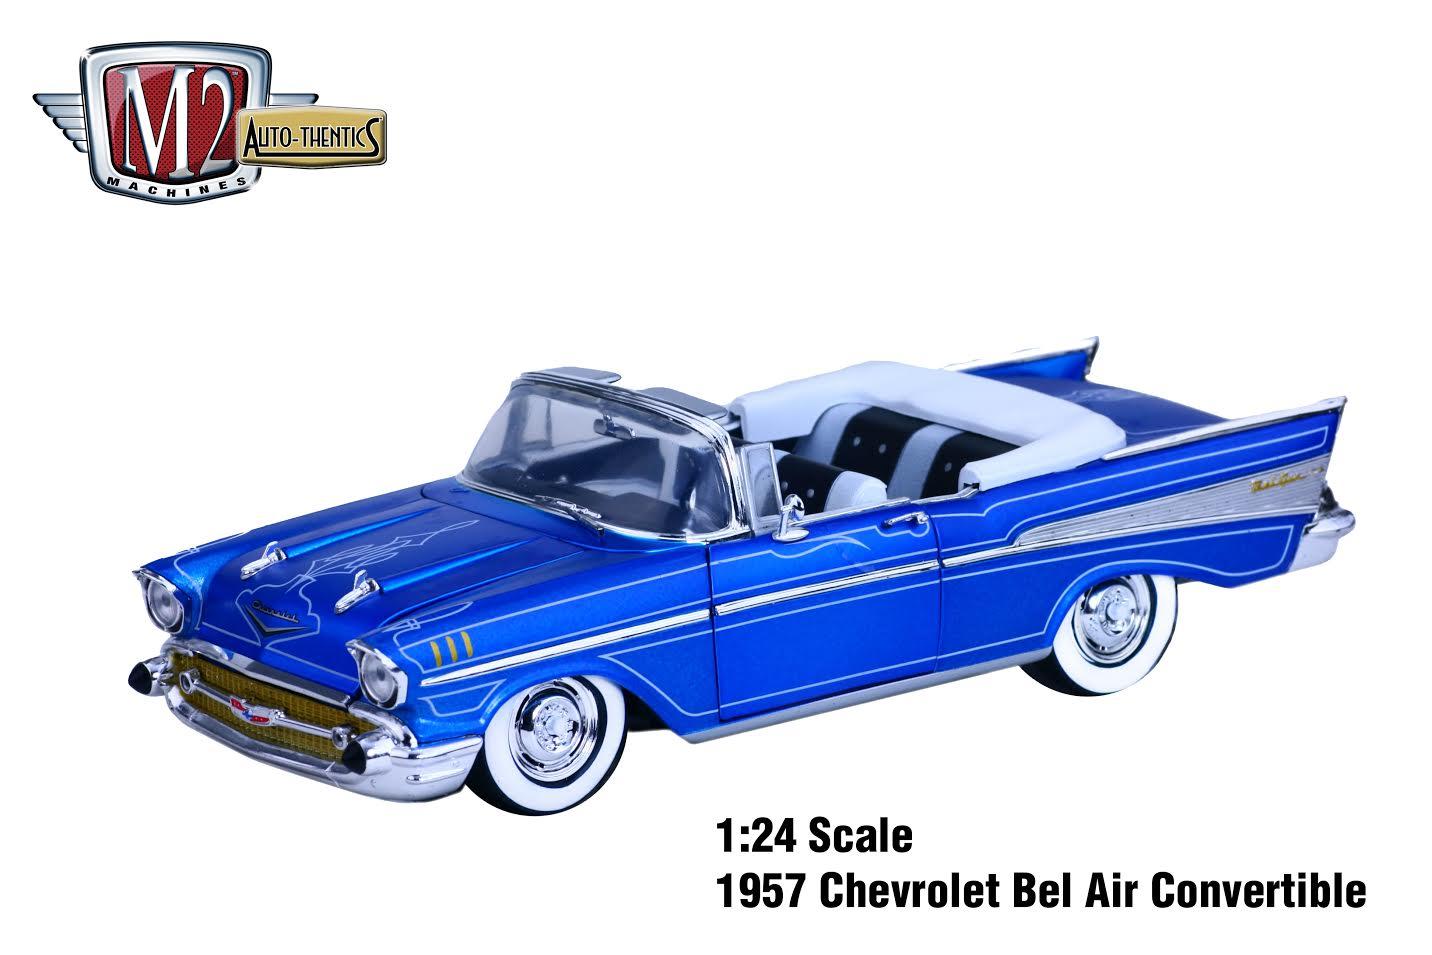 Diecast Cars 1 64 Modellautos 164 Modellbilar M2 Machines News 1957 Chevy Bel Air Convertible Lowrider 24 Release 51a B Chevrolet